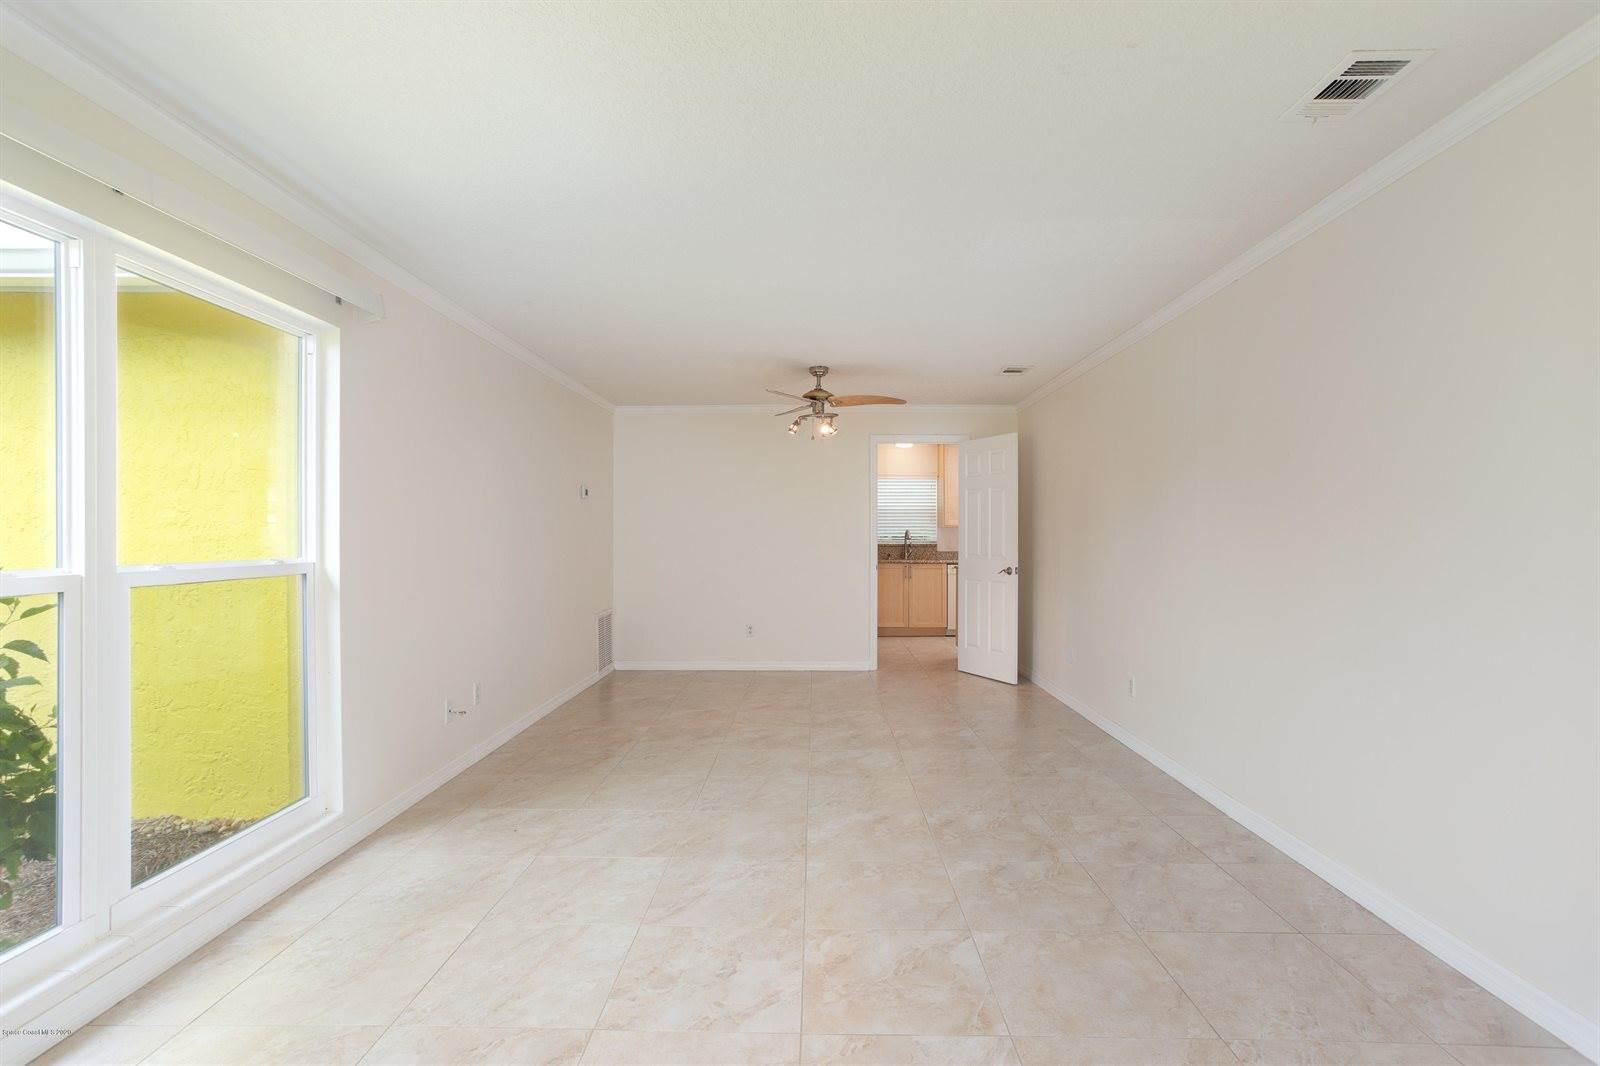 162 Terrace Shores Drive, Indialantic, FL 32903